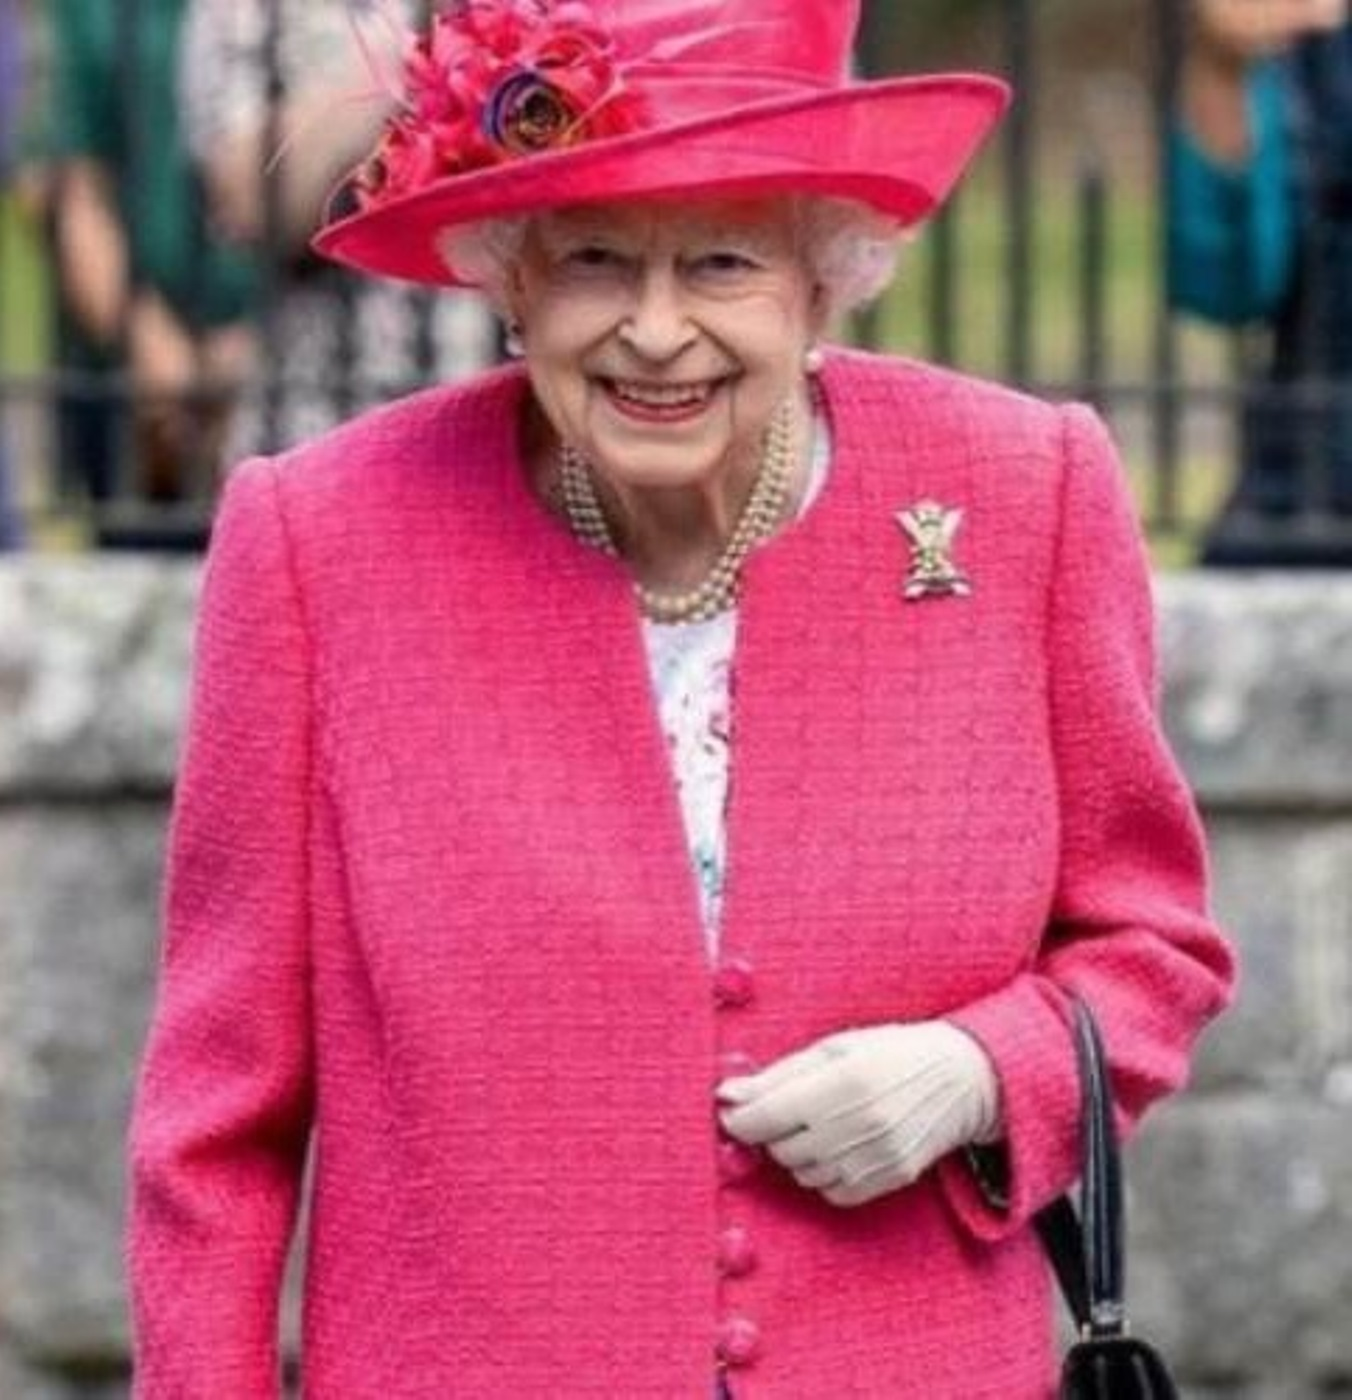 regina elisabetta morta london bridge down